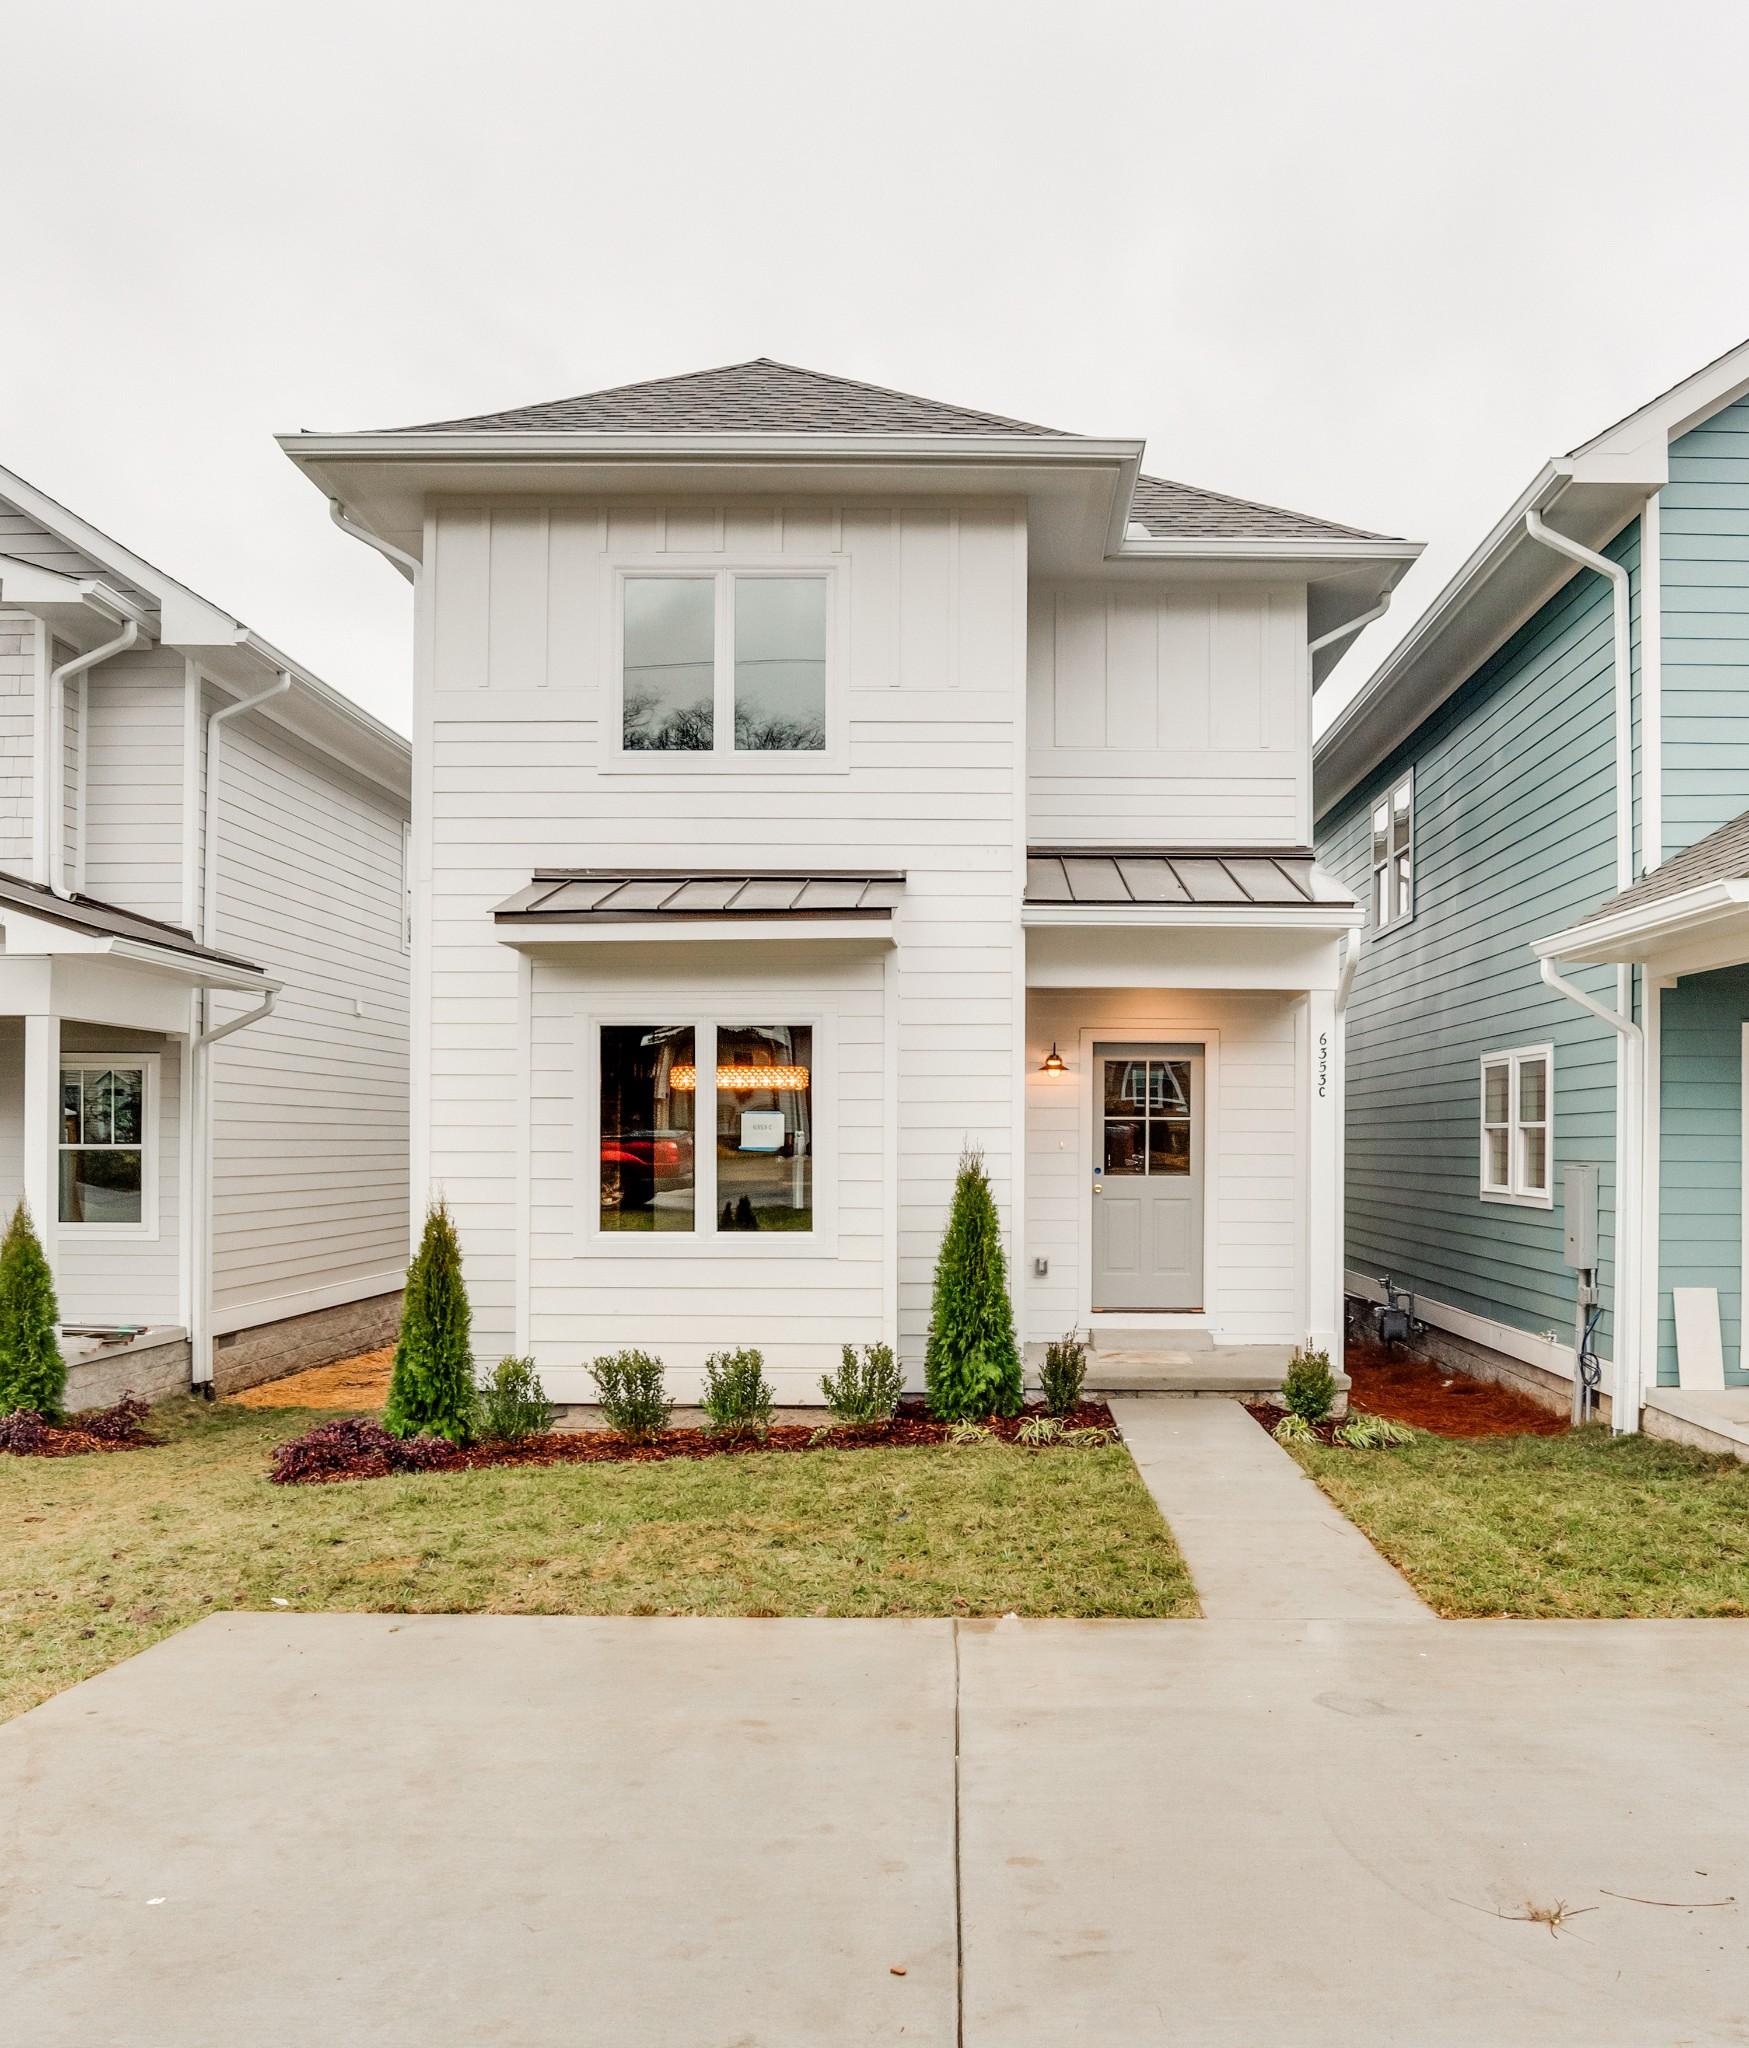 6353C Columbia Ave, Nashville, TN 37209 - Nashville, TN real estate listing